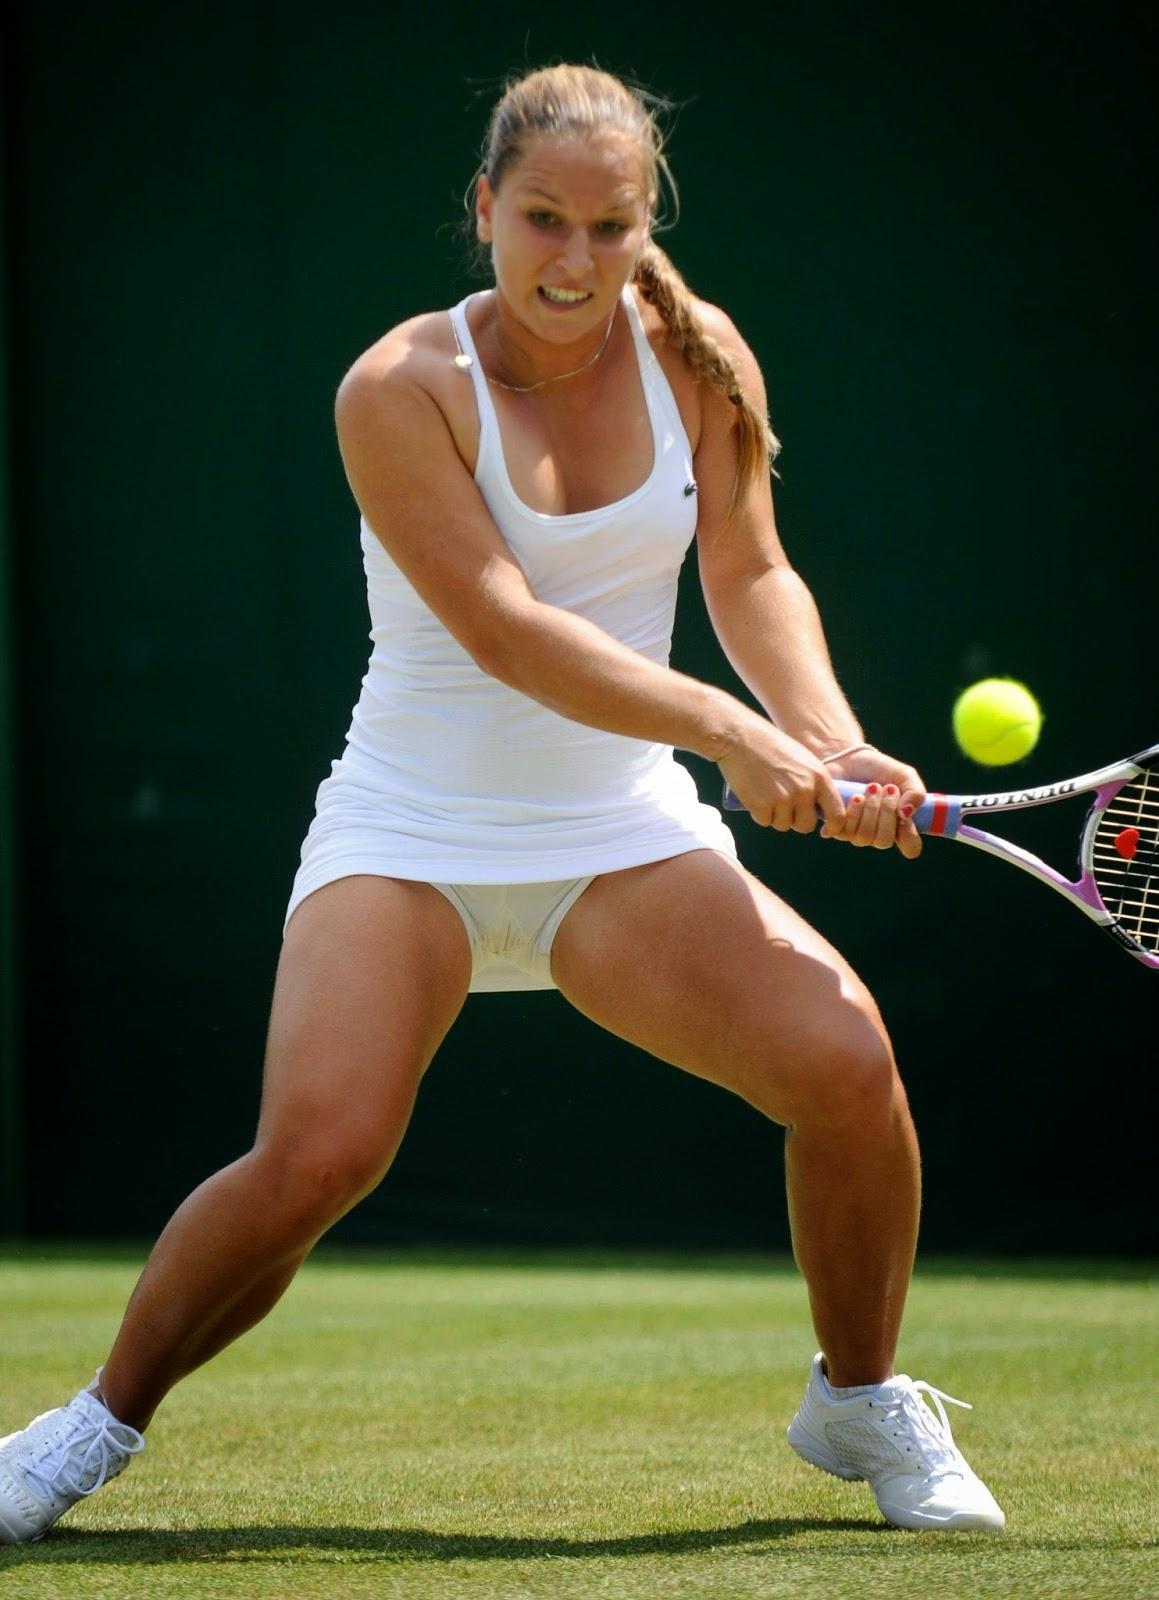 tennisistki-svetyat-trusikami-foto